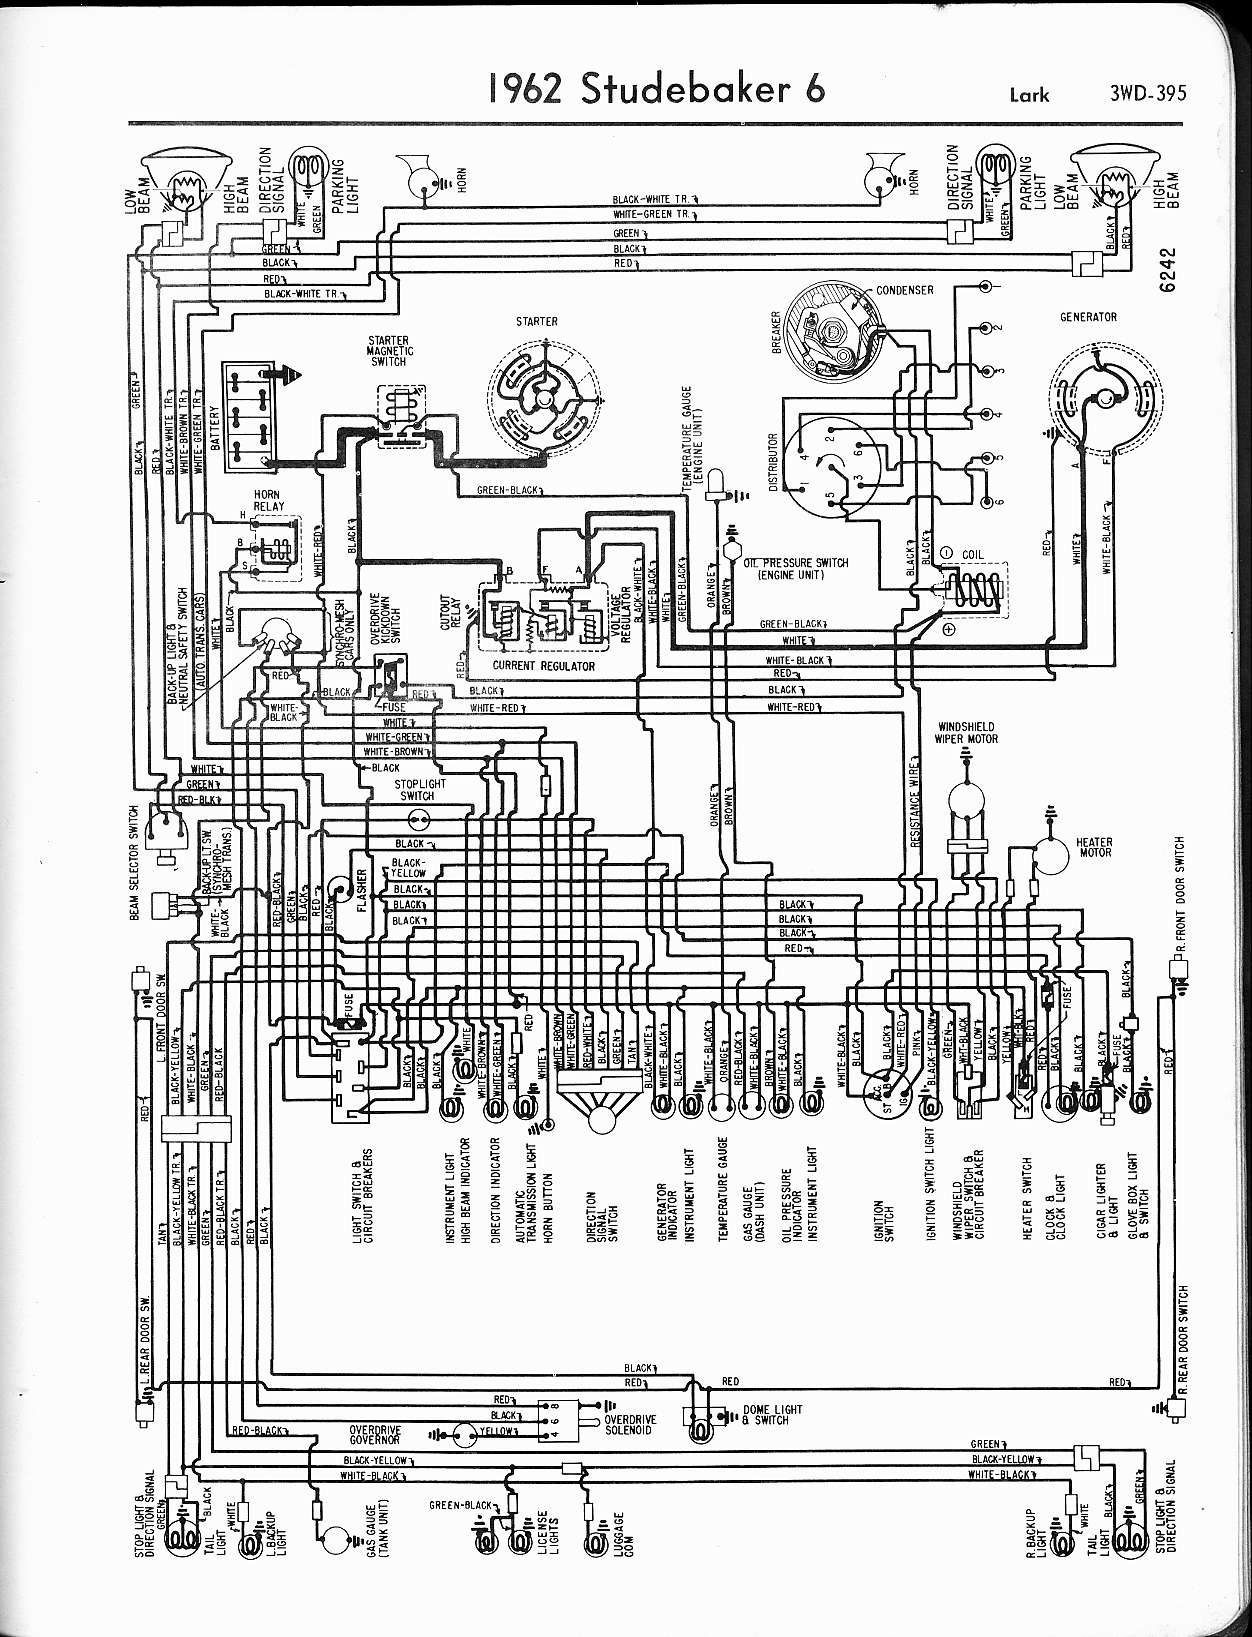 1963 studebaker hawk wiring diagram 1963 studebaker gran